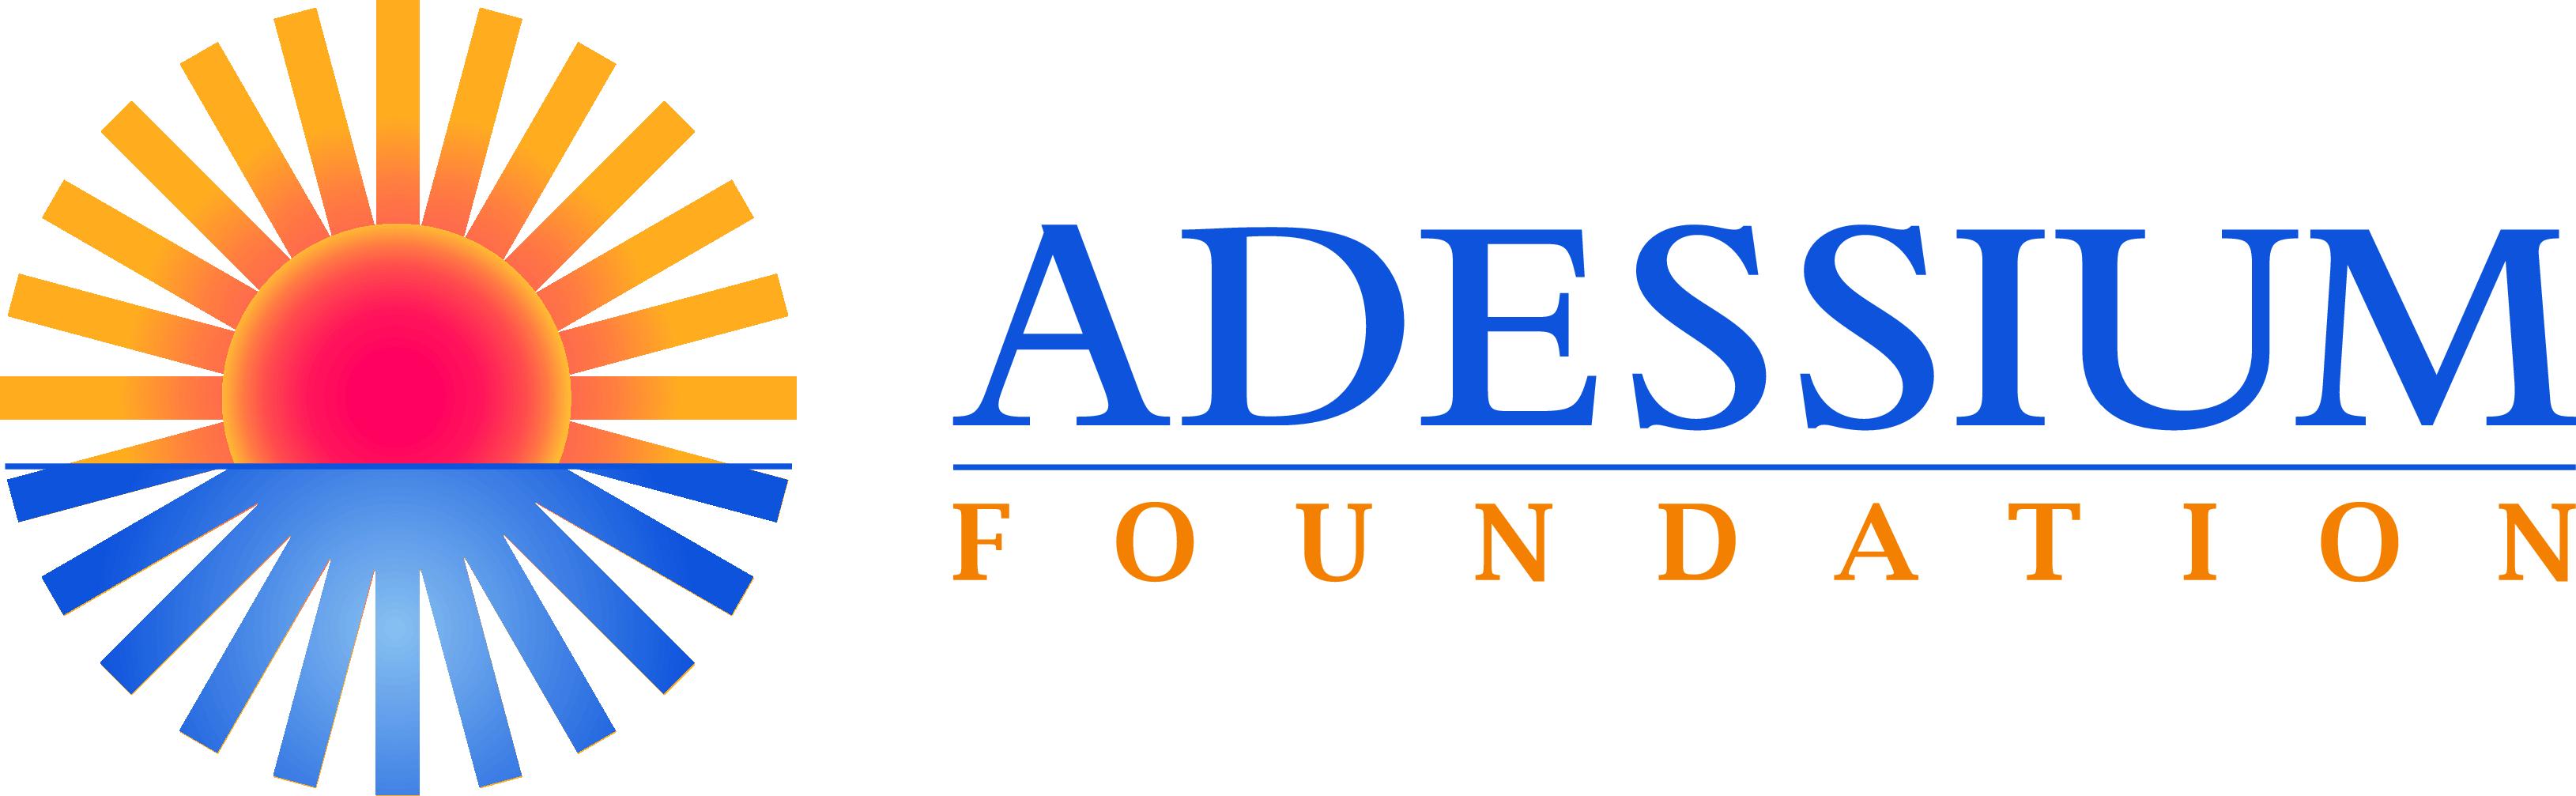 logo-adessium-foundation